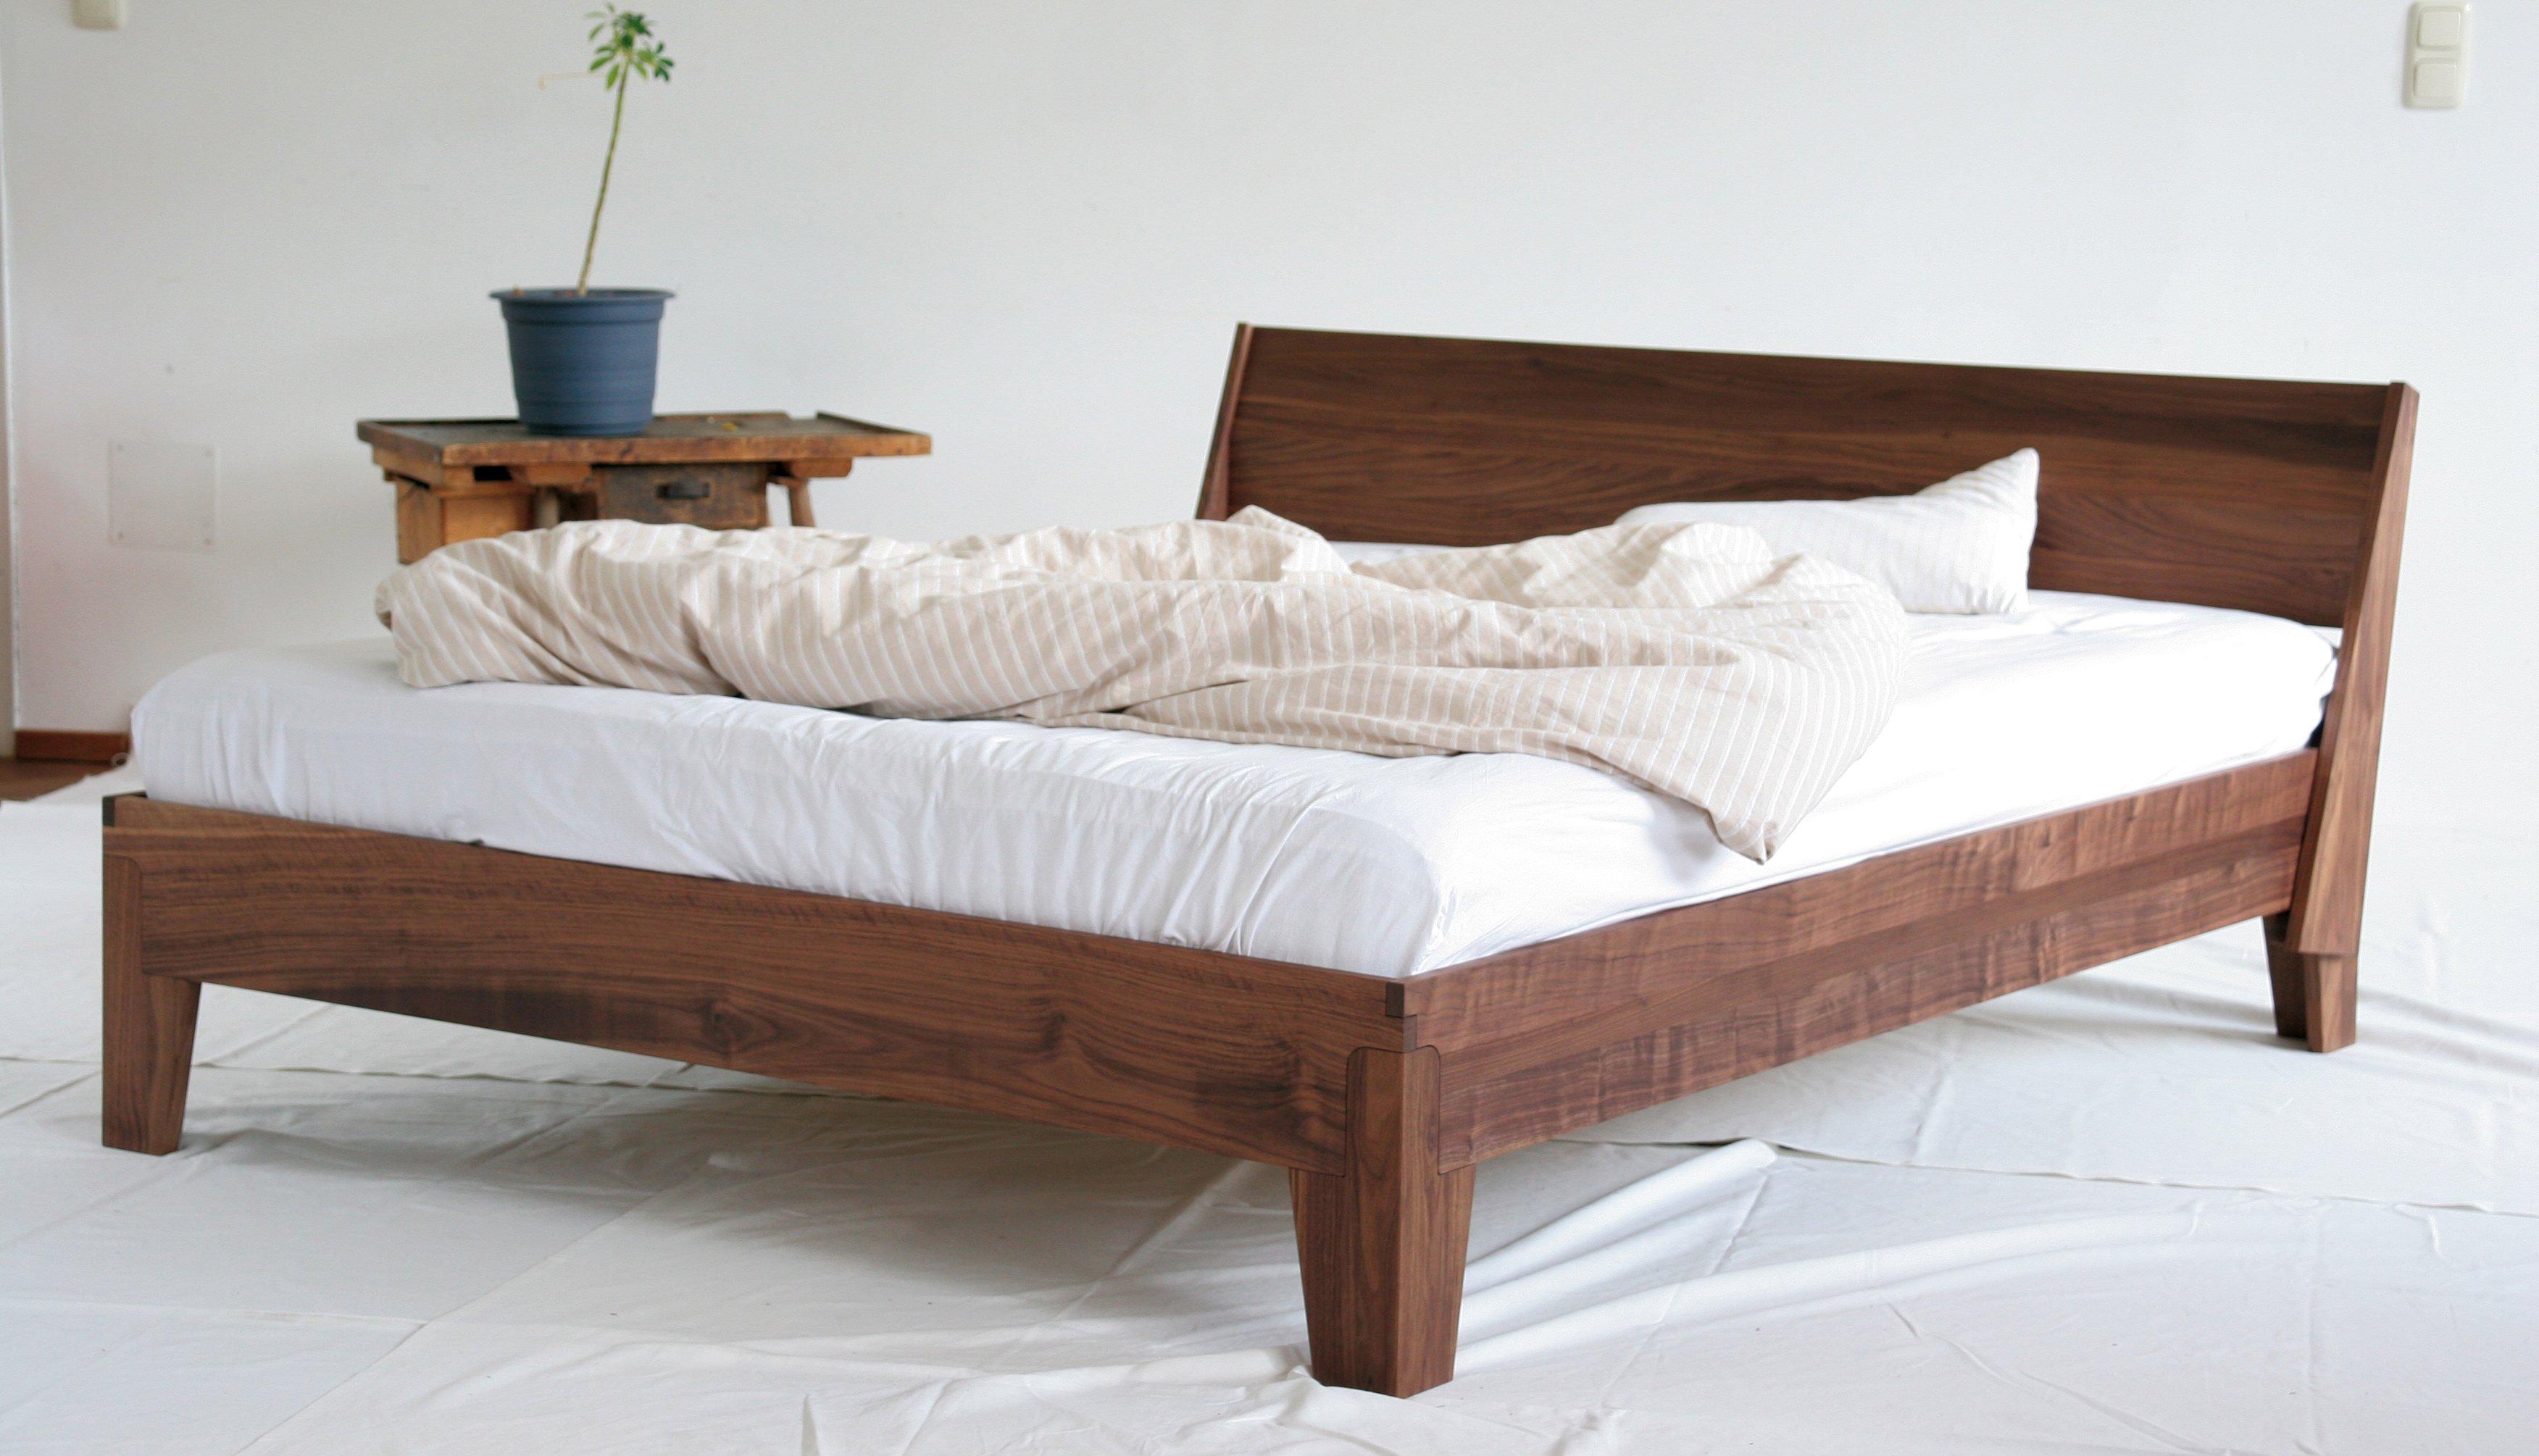 charmant bettrahmen kosten bilder bilderrahmen ideen. Black Bedroom Furniture Sets. Home Design Ideas